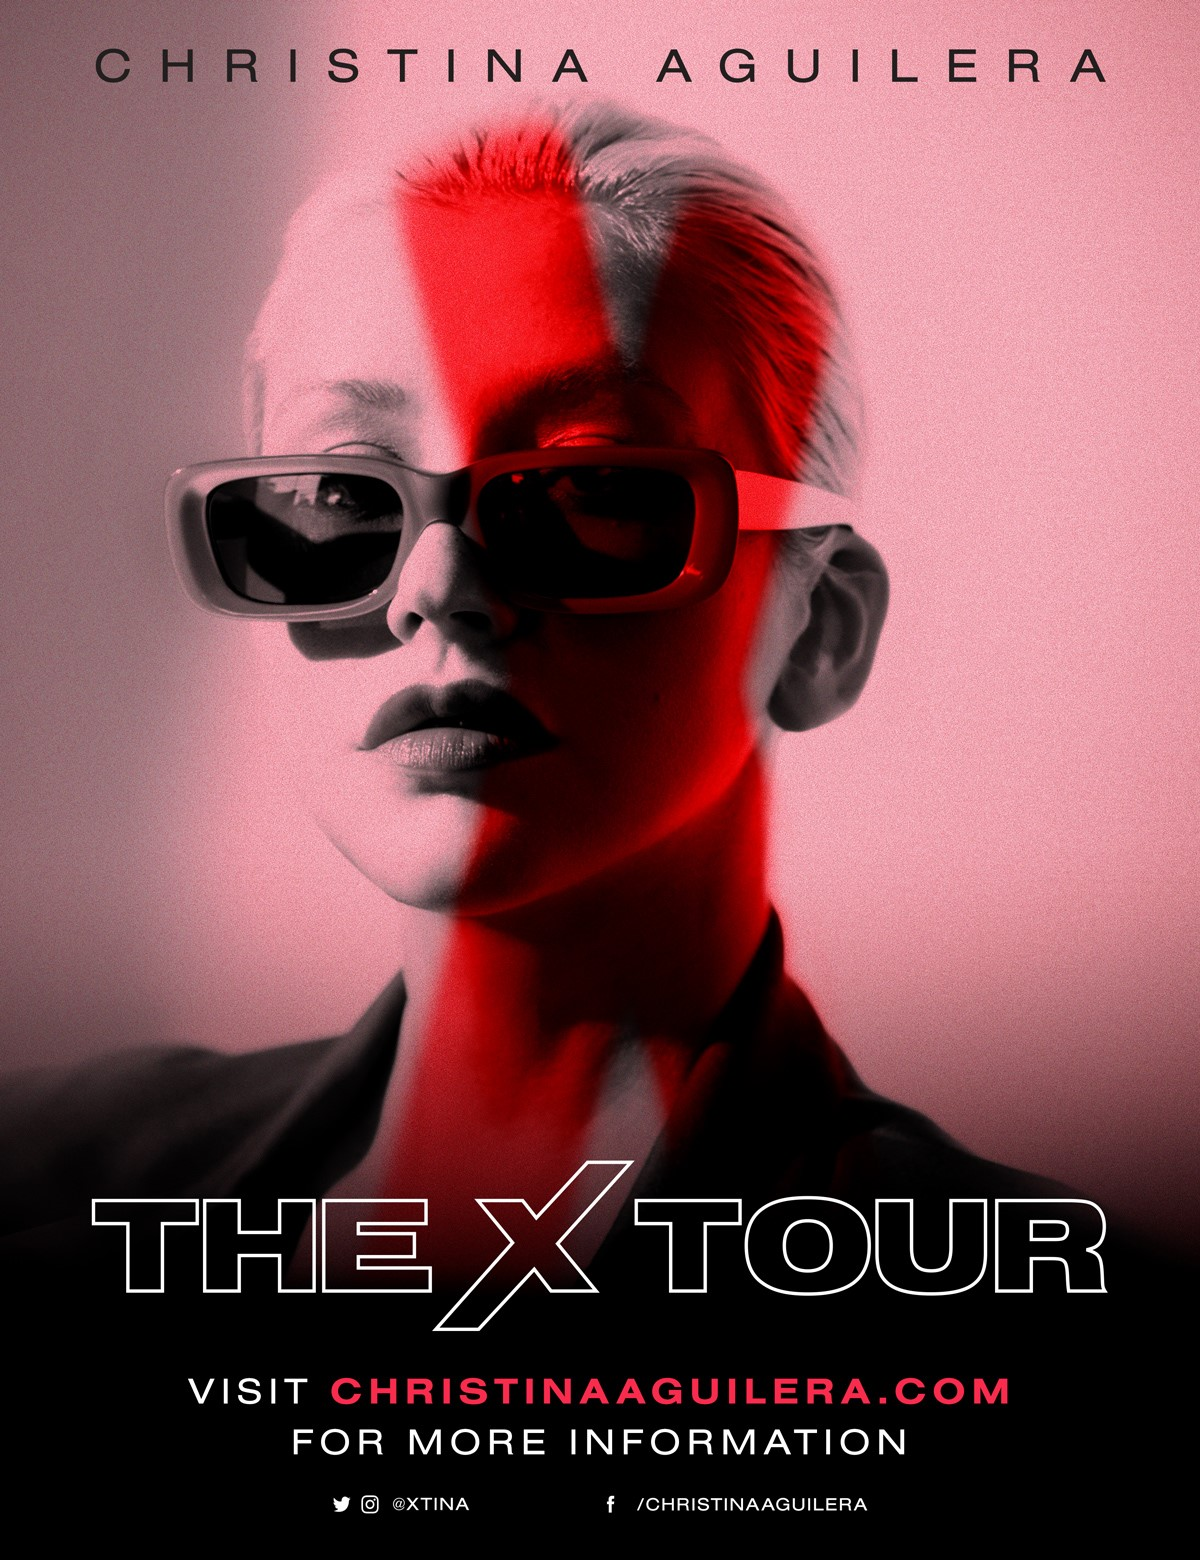 International Superstar CHRISTINA AGUILERA announces The X Tour